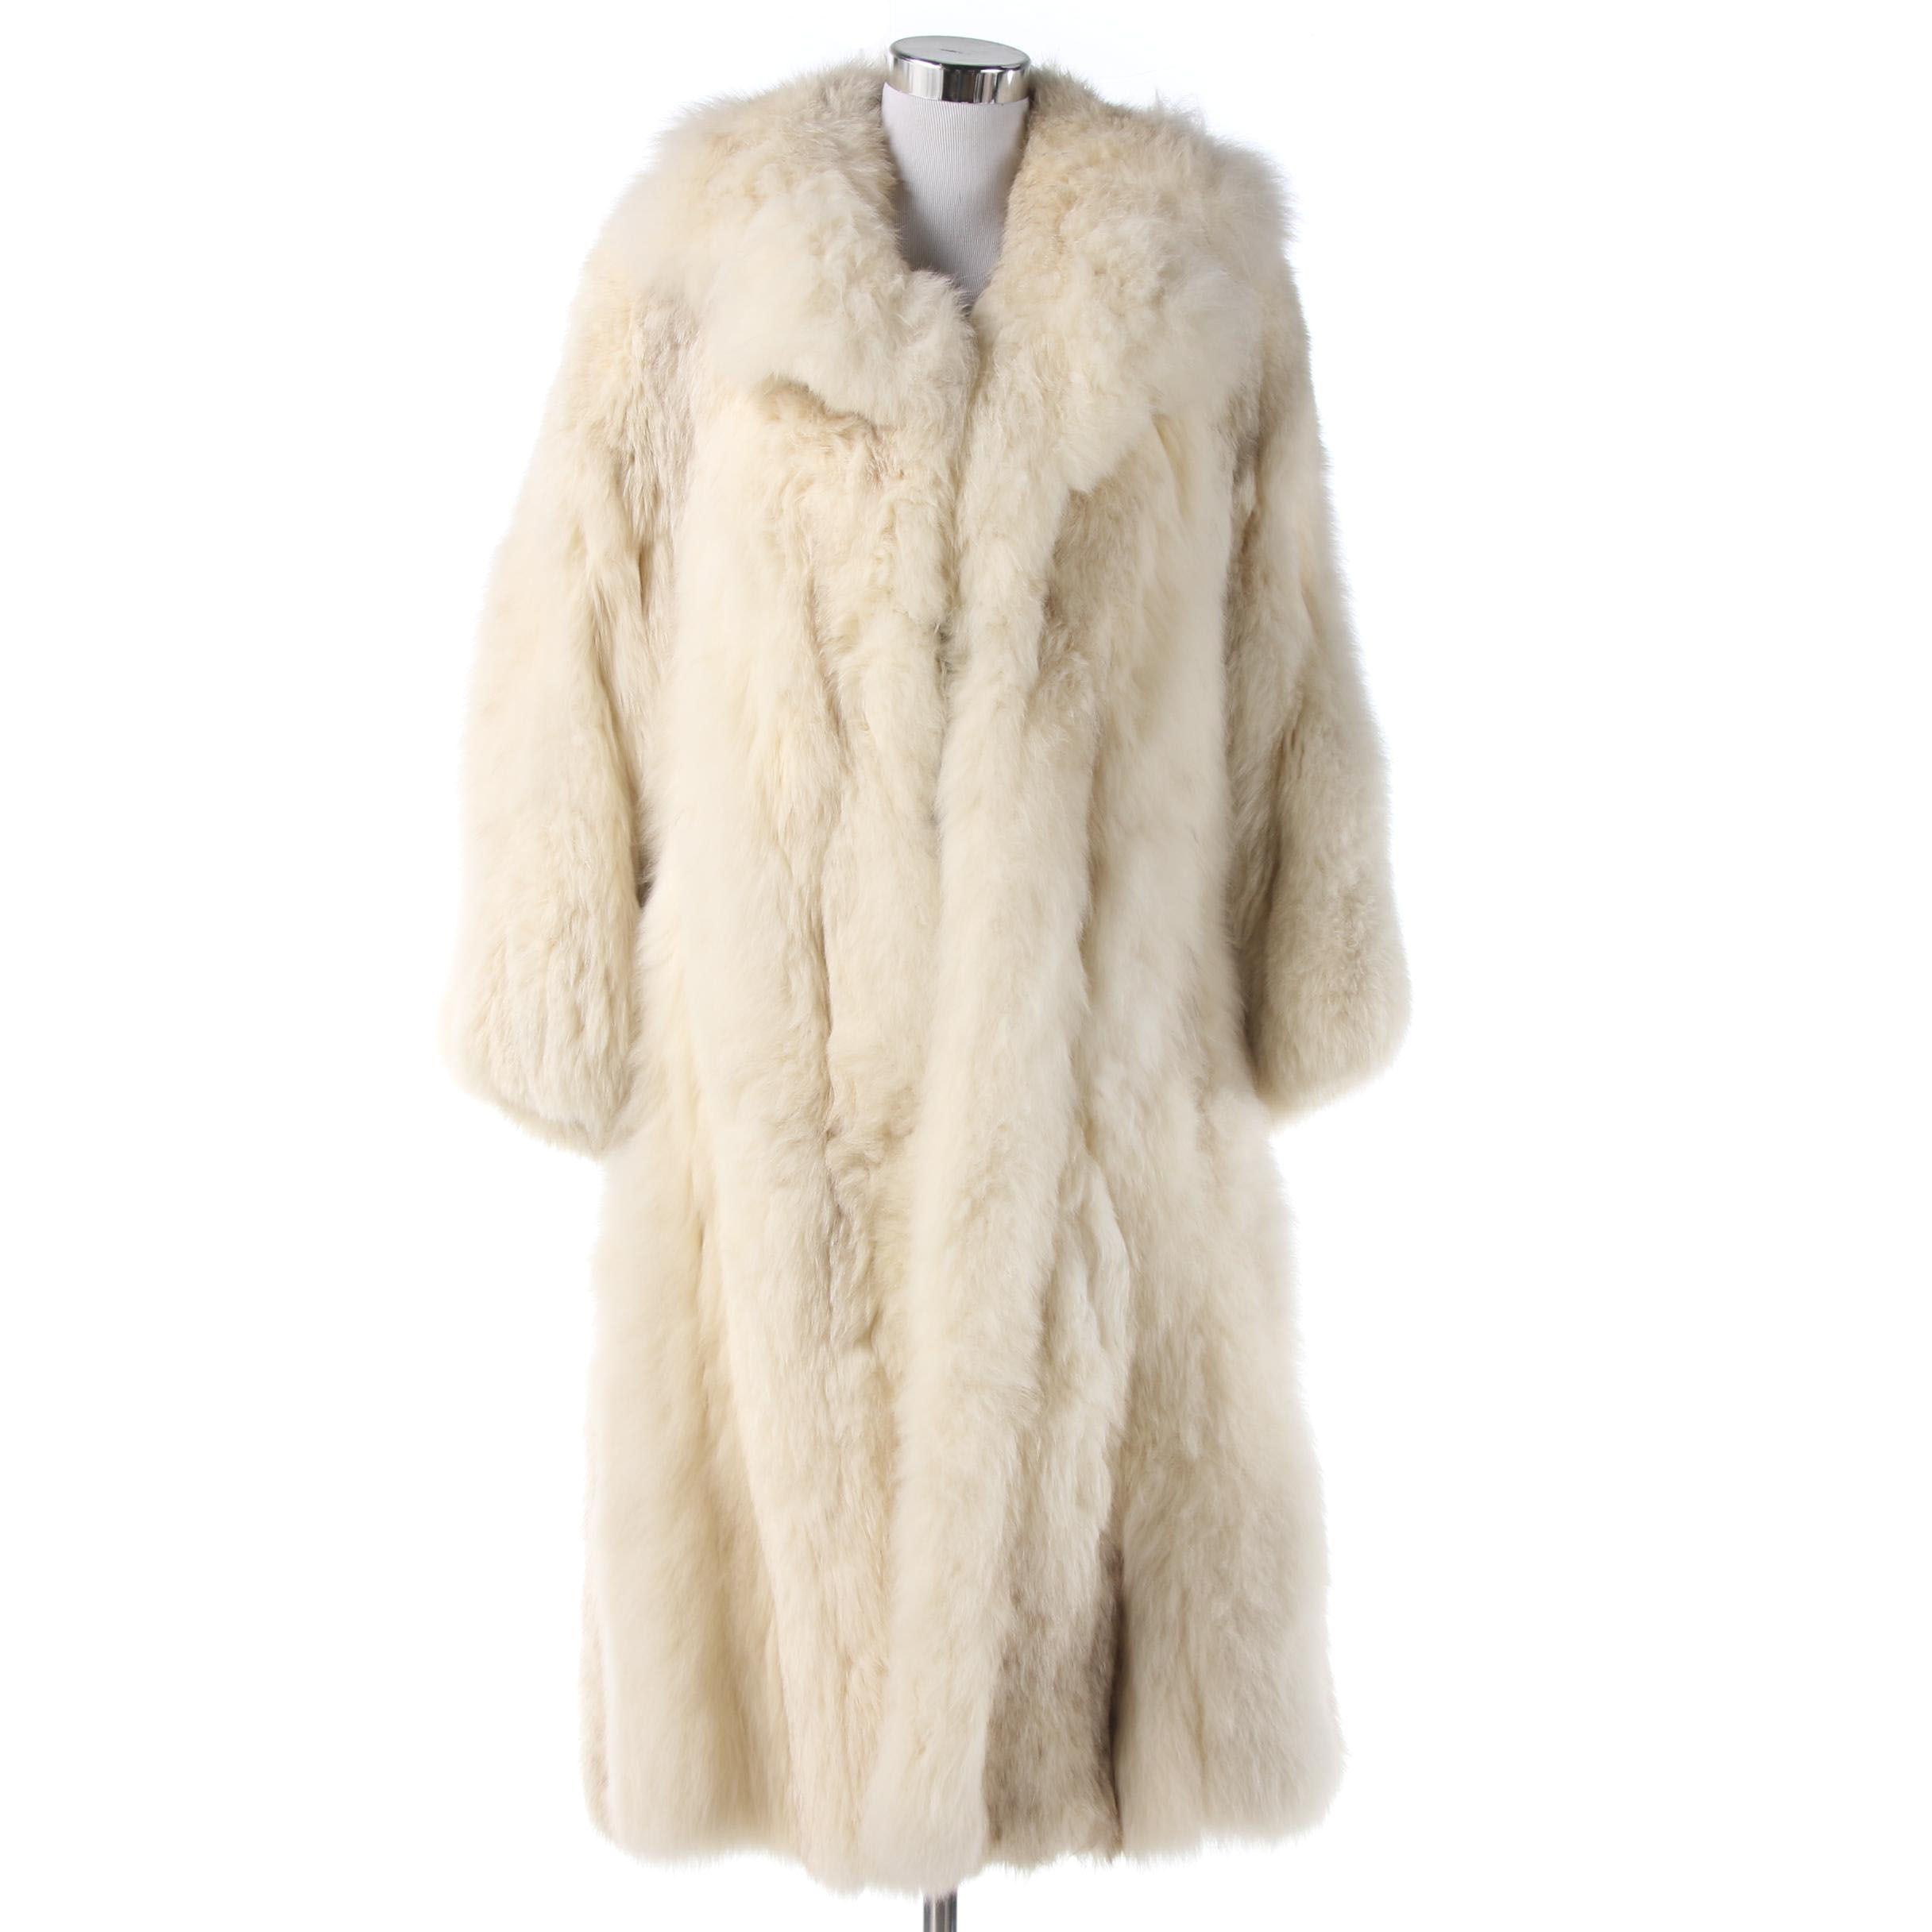 Davellin New York Fox Fur Coat, 1970s Vintage